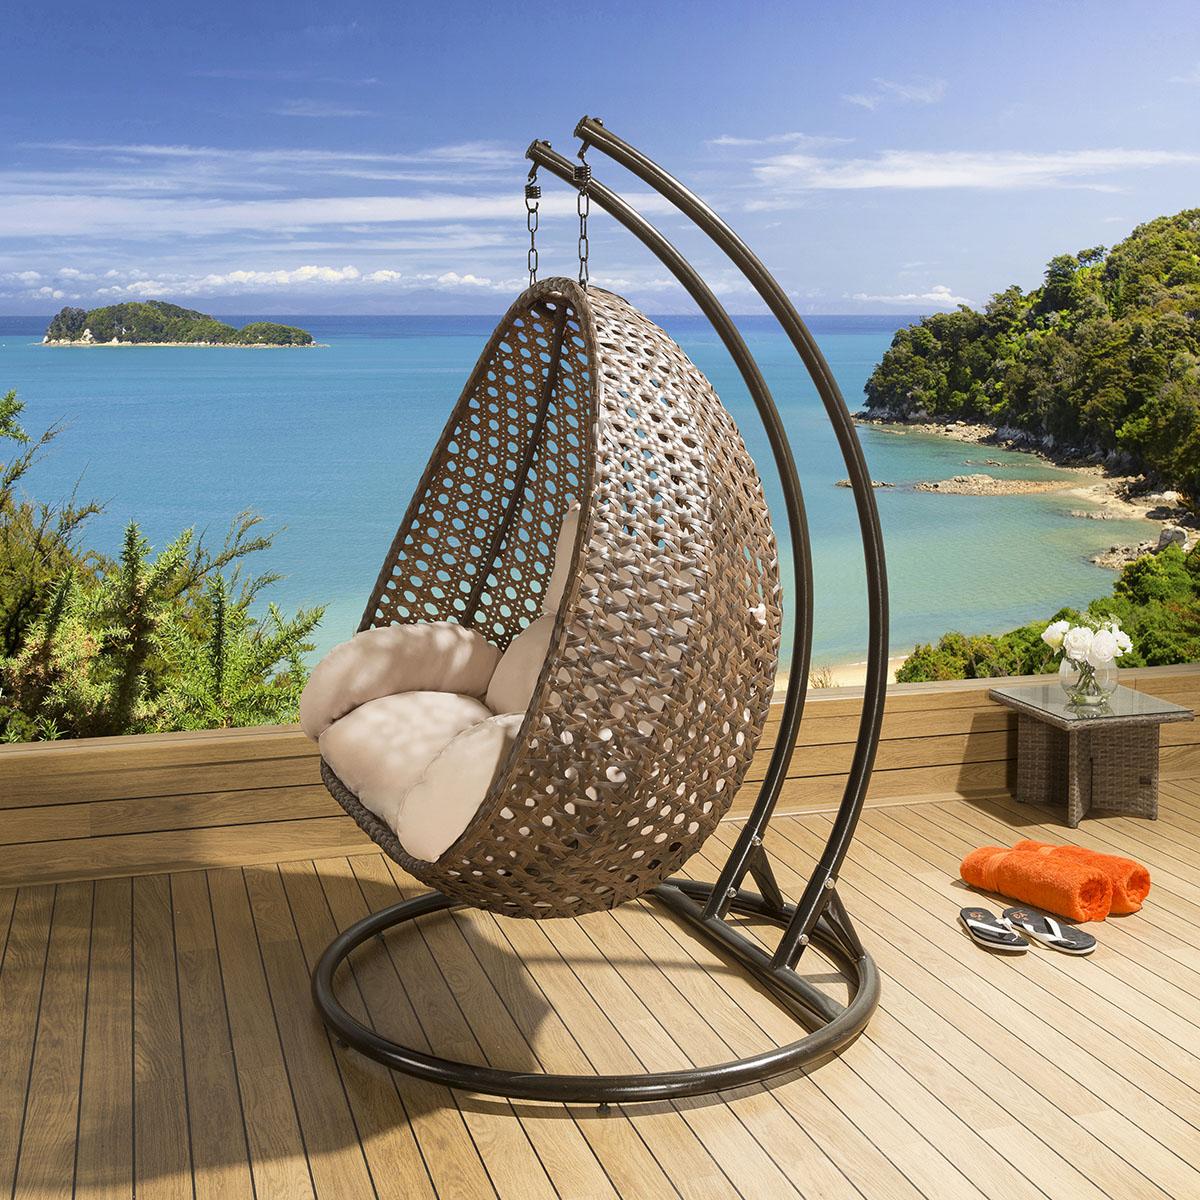 outside hanging chair uk folding outdoor chairs walmart 2 person garden brown rattan cream